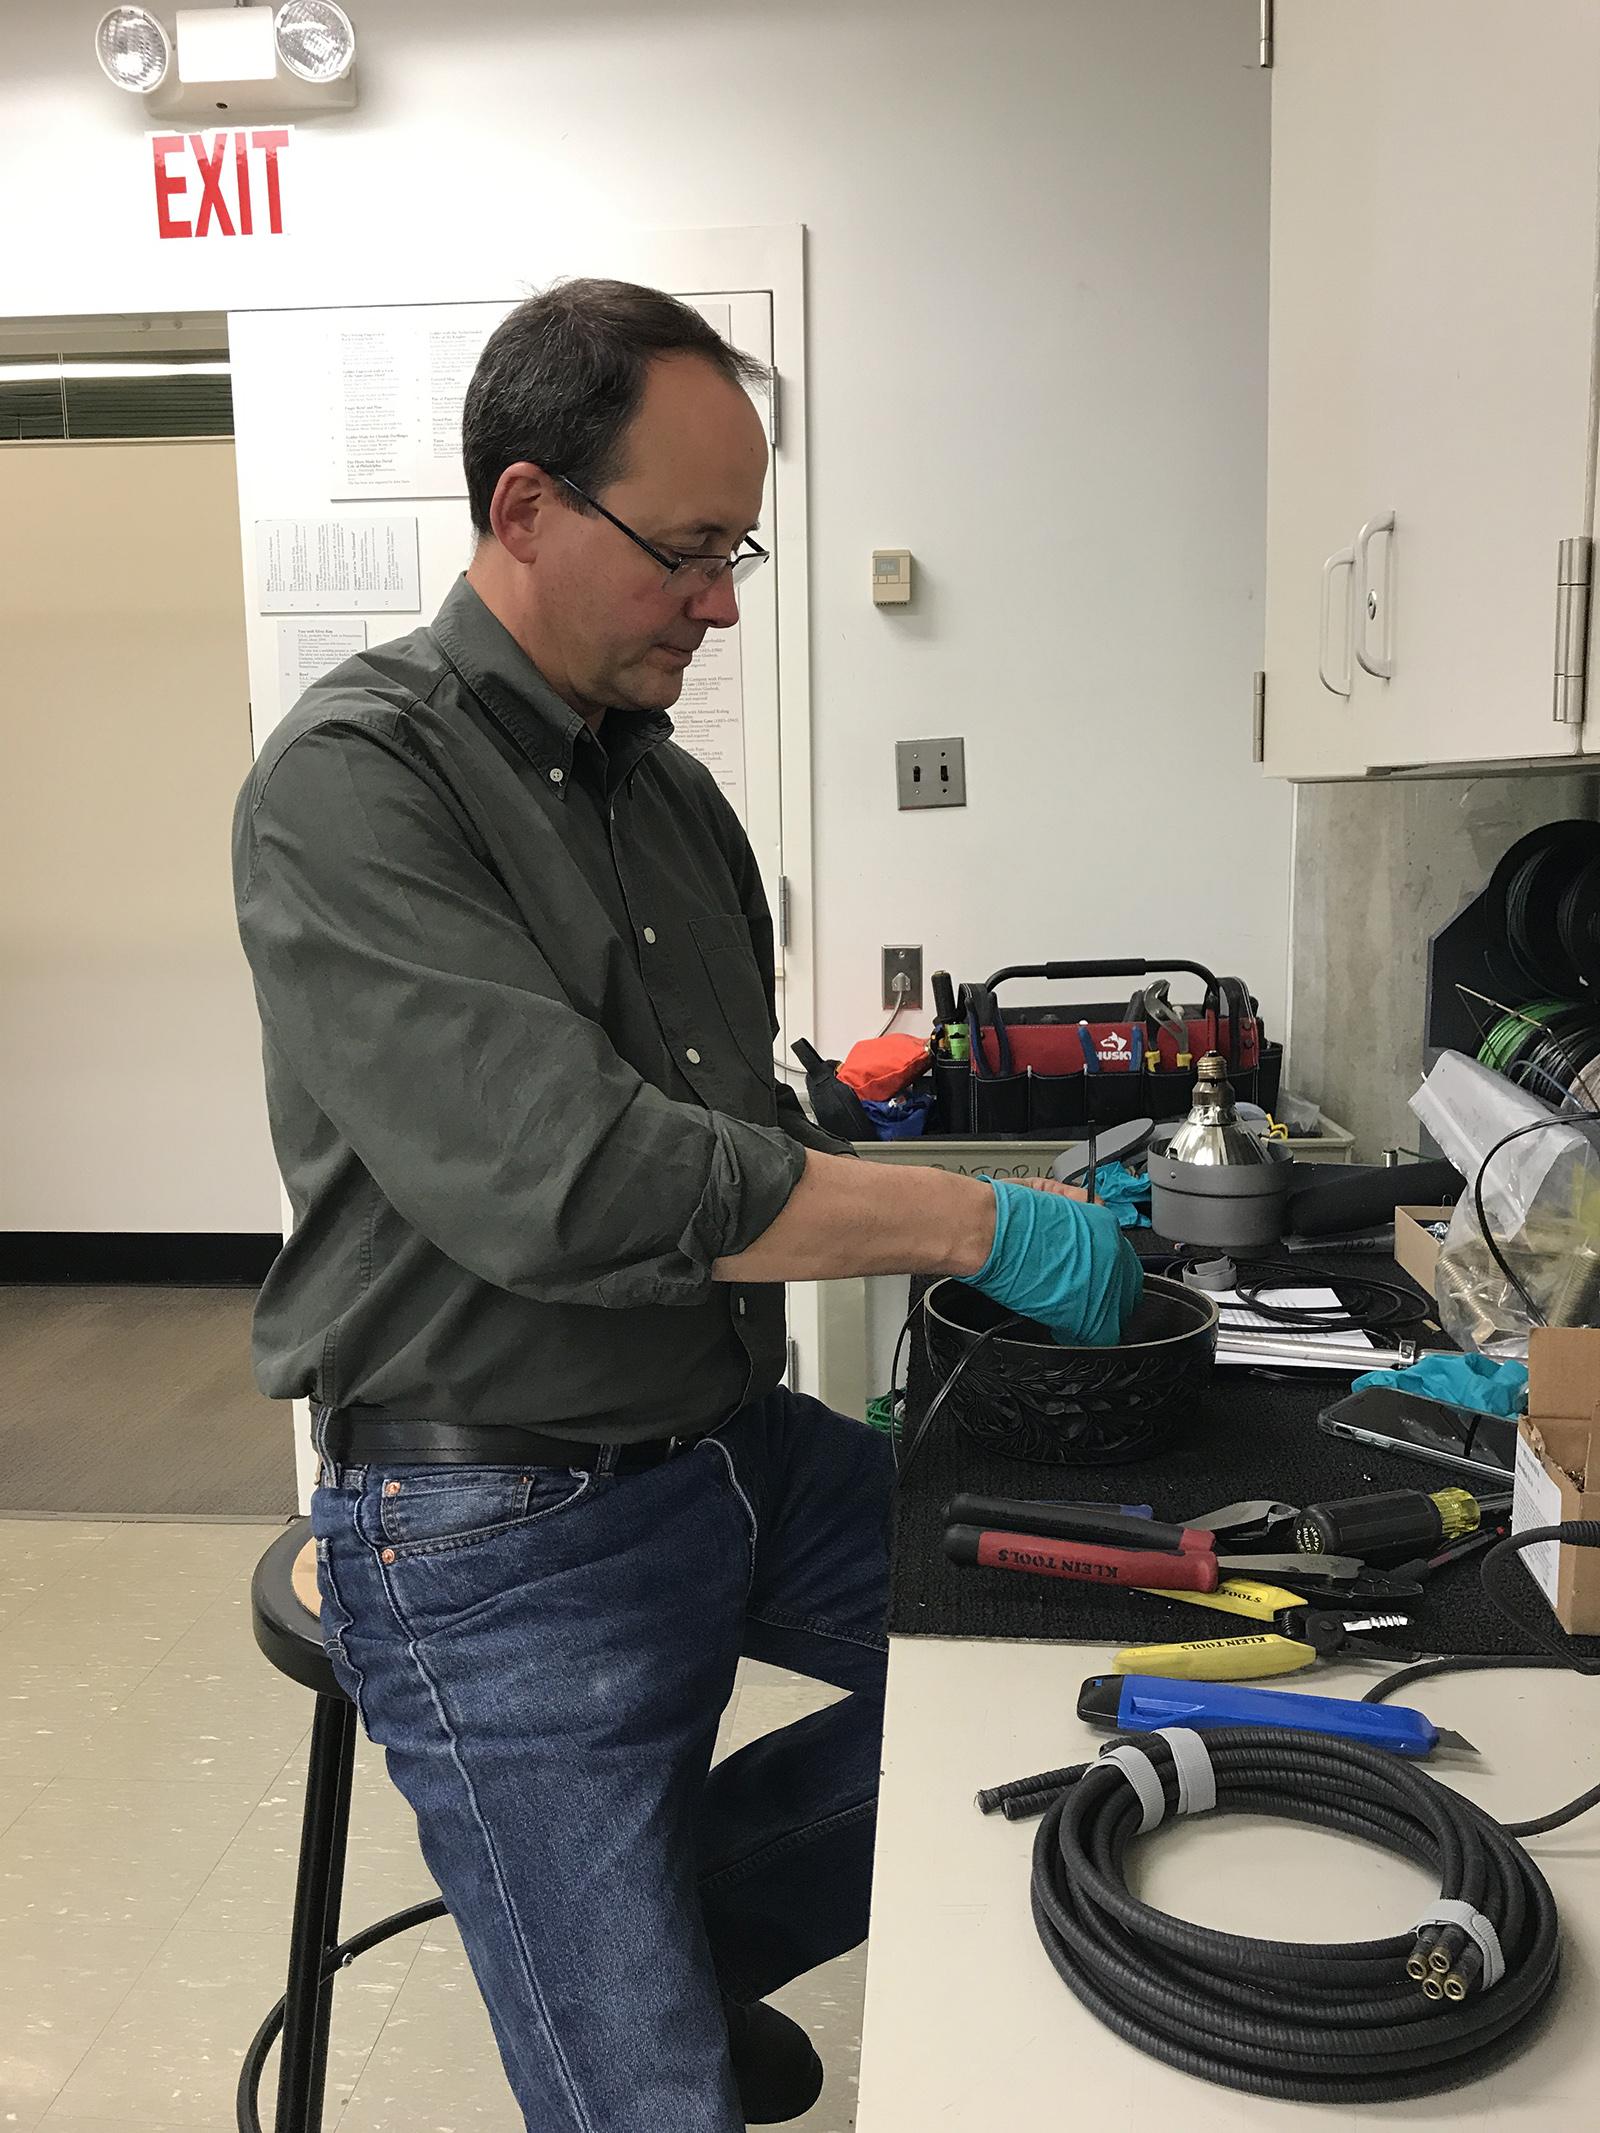 Dave Kuentz, Preparator, rewiring and replacing bulbs.